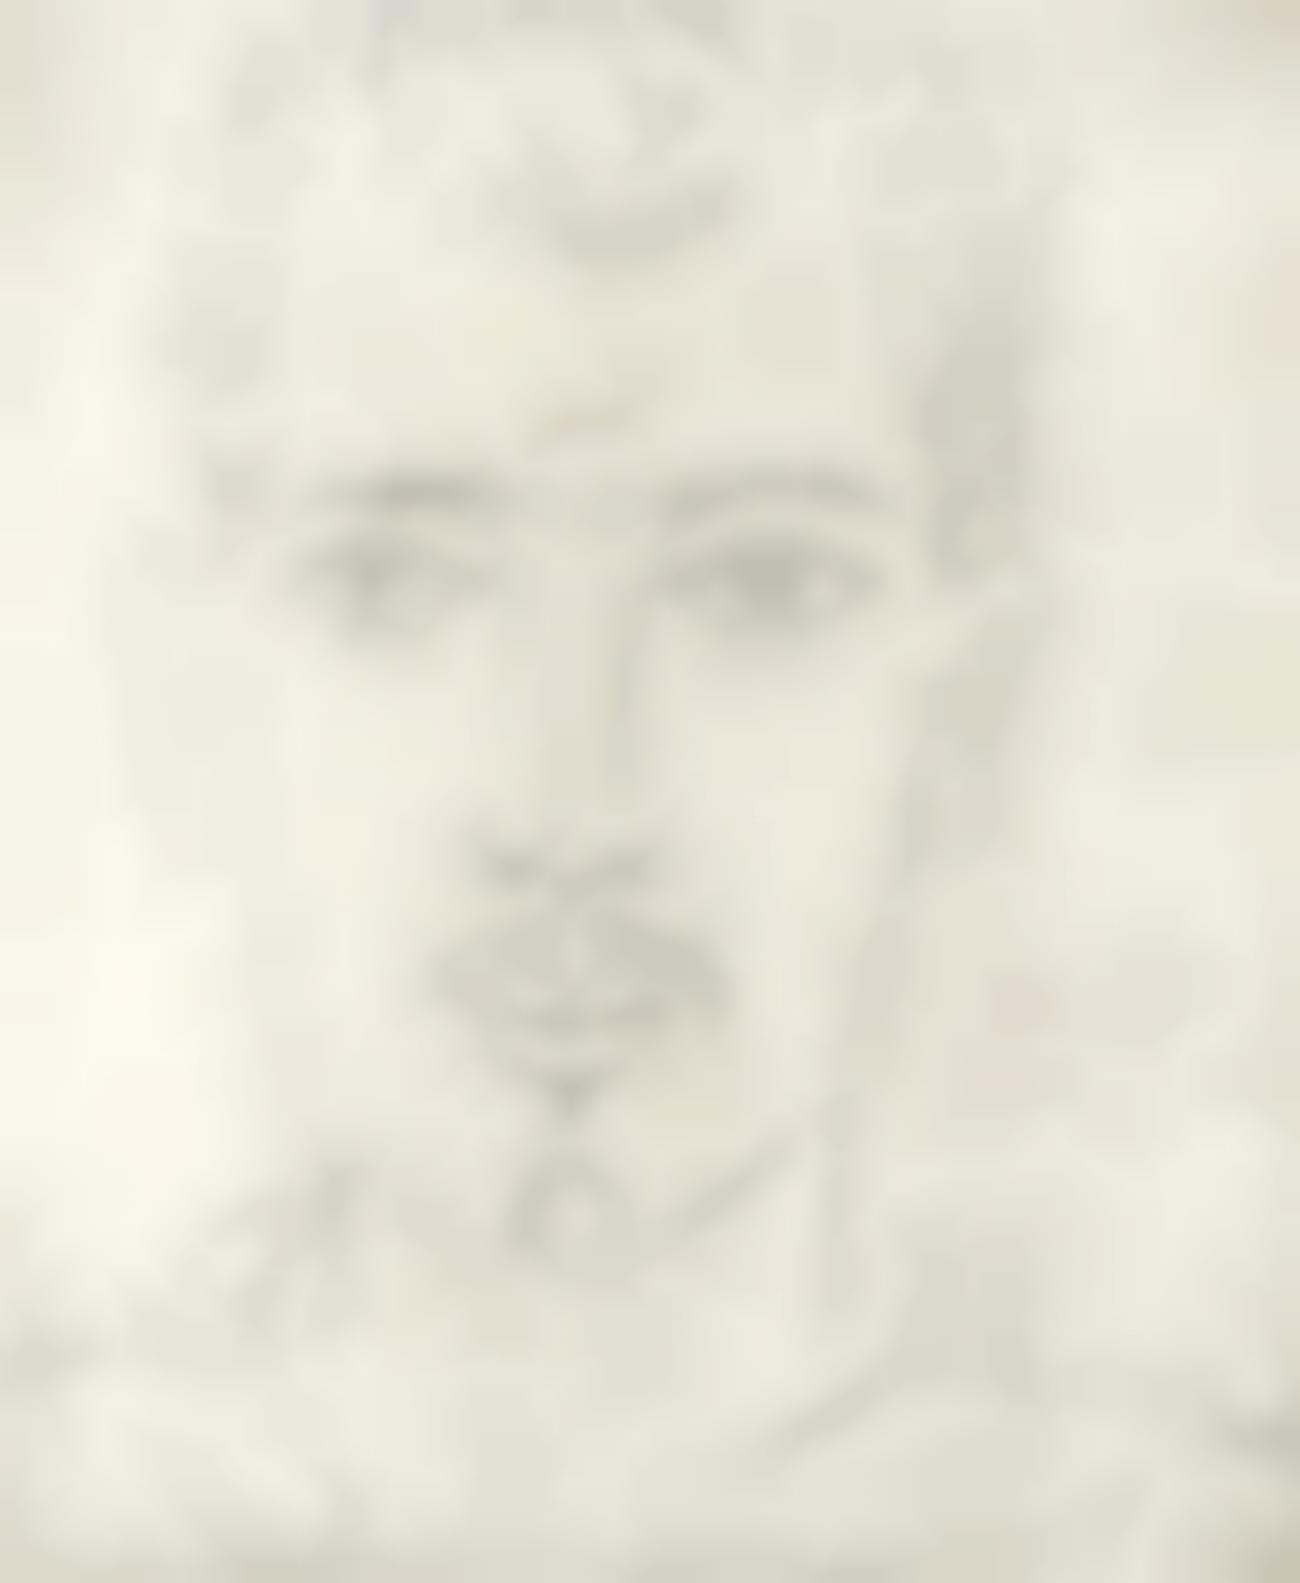 John Craxton - Portrait Of A Man-1989